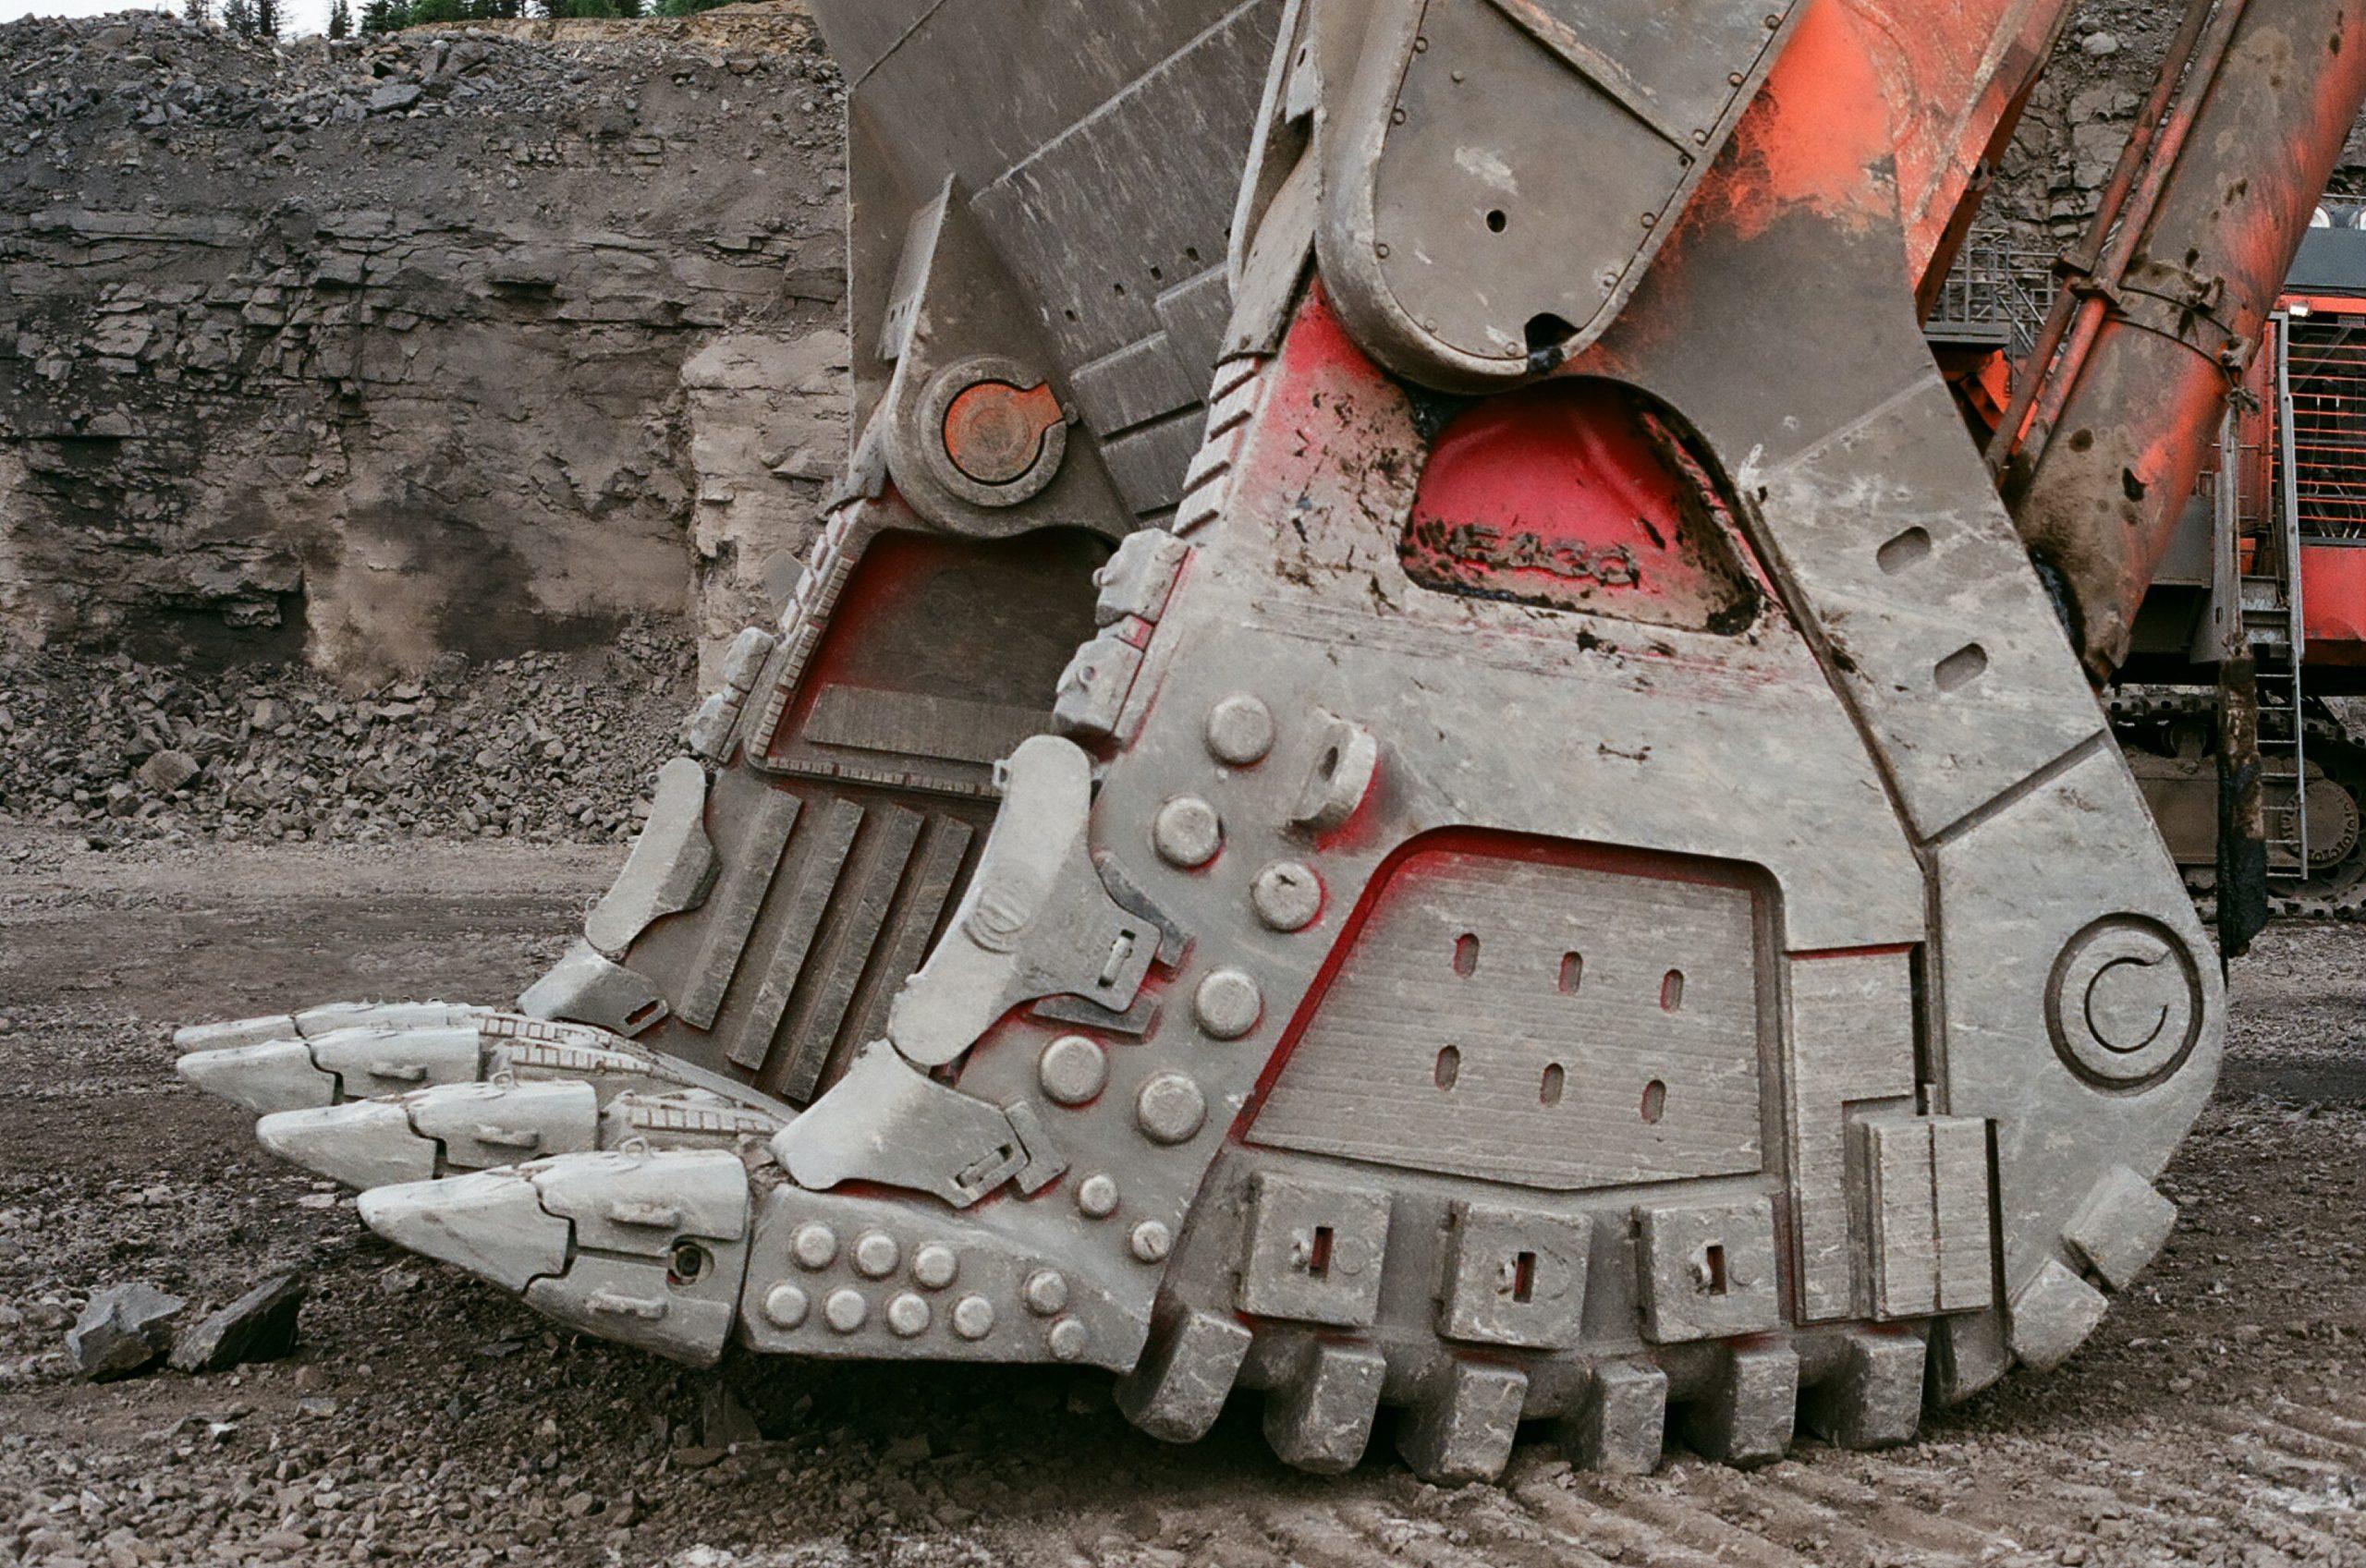 mining equipment on mining operation